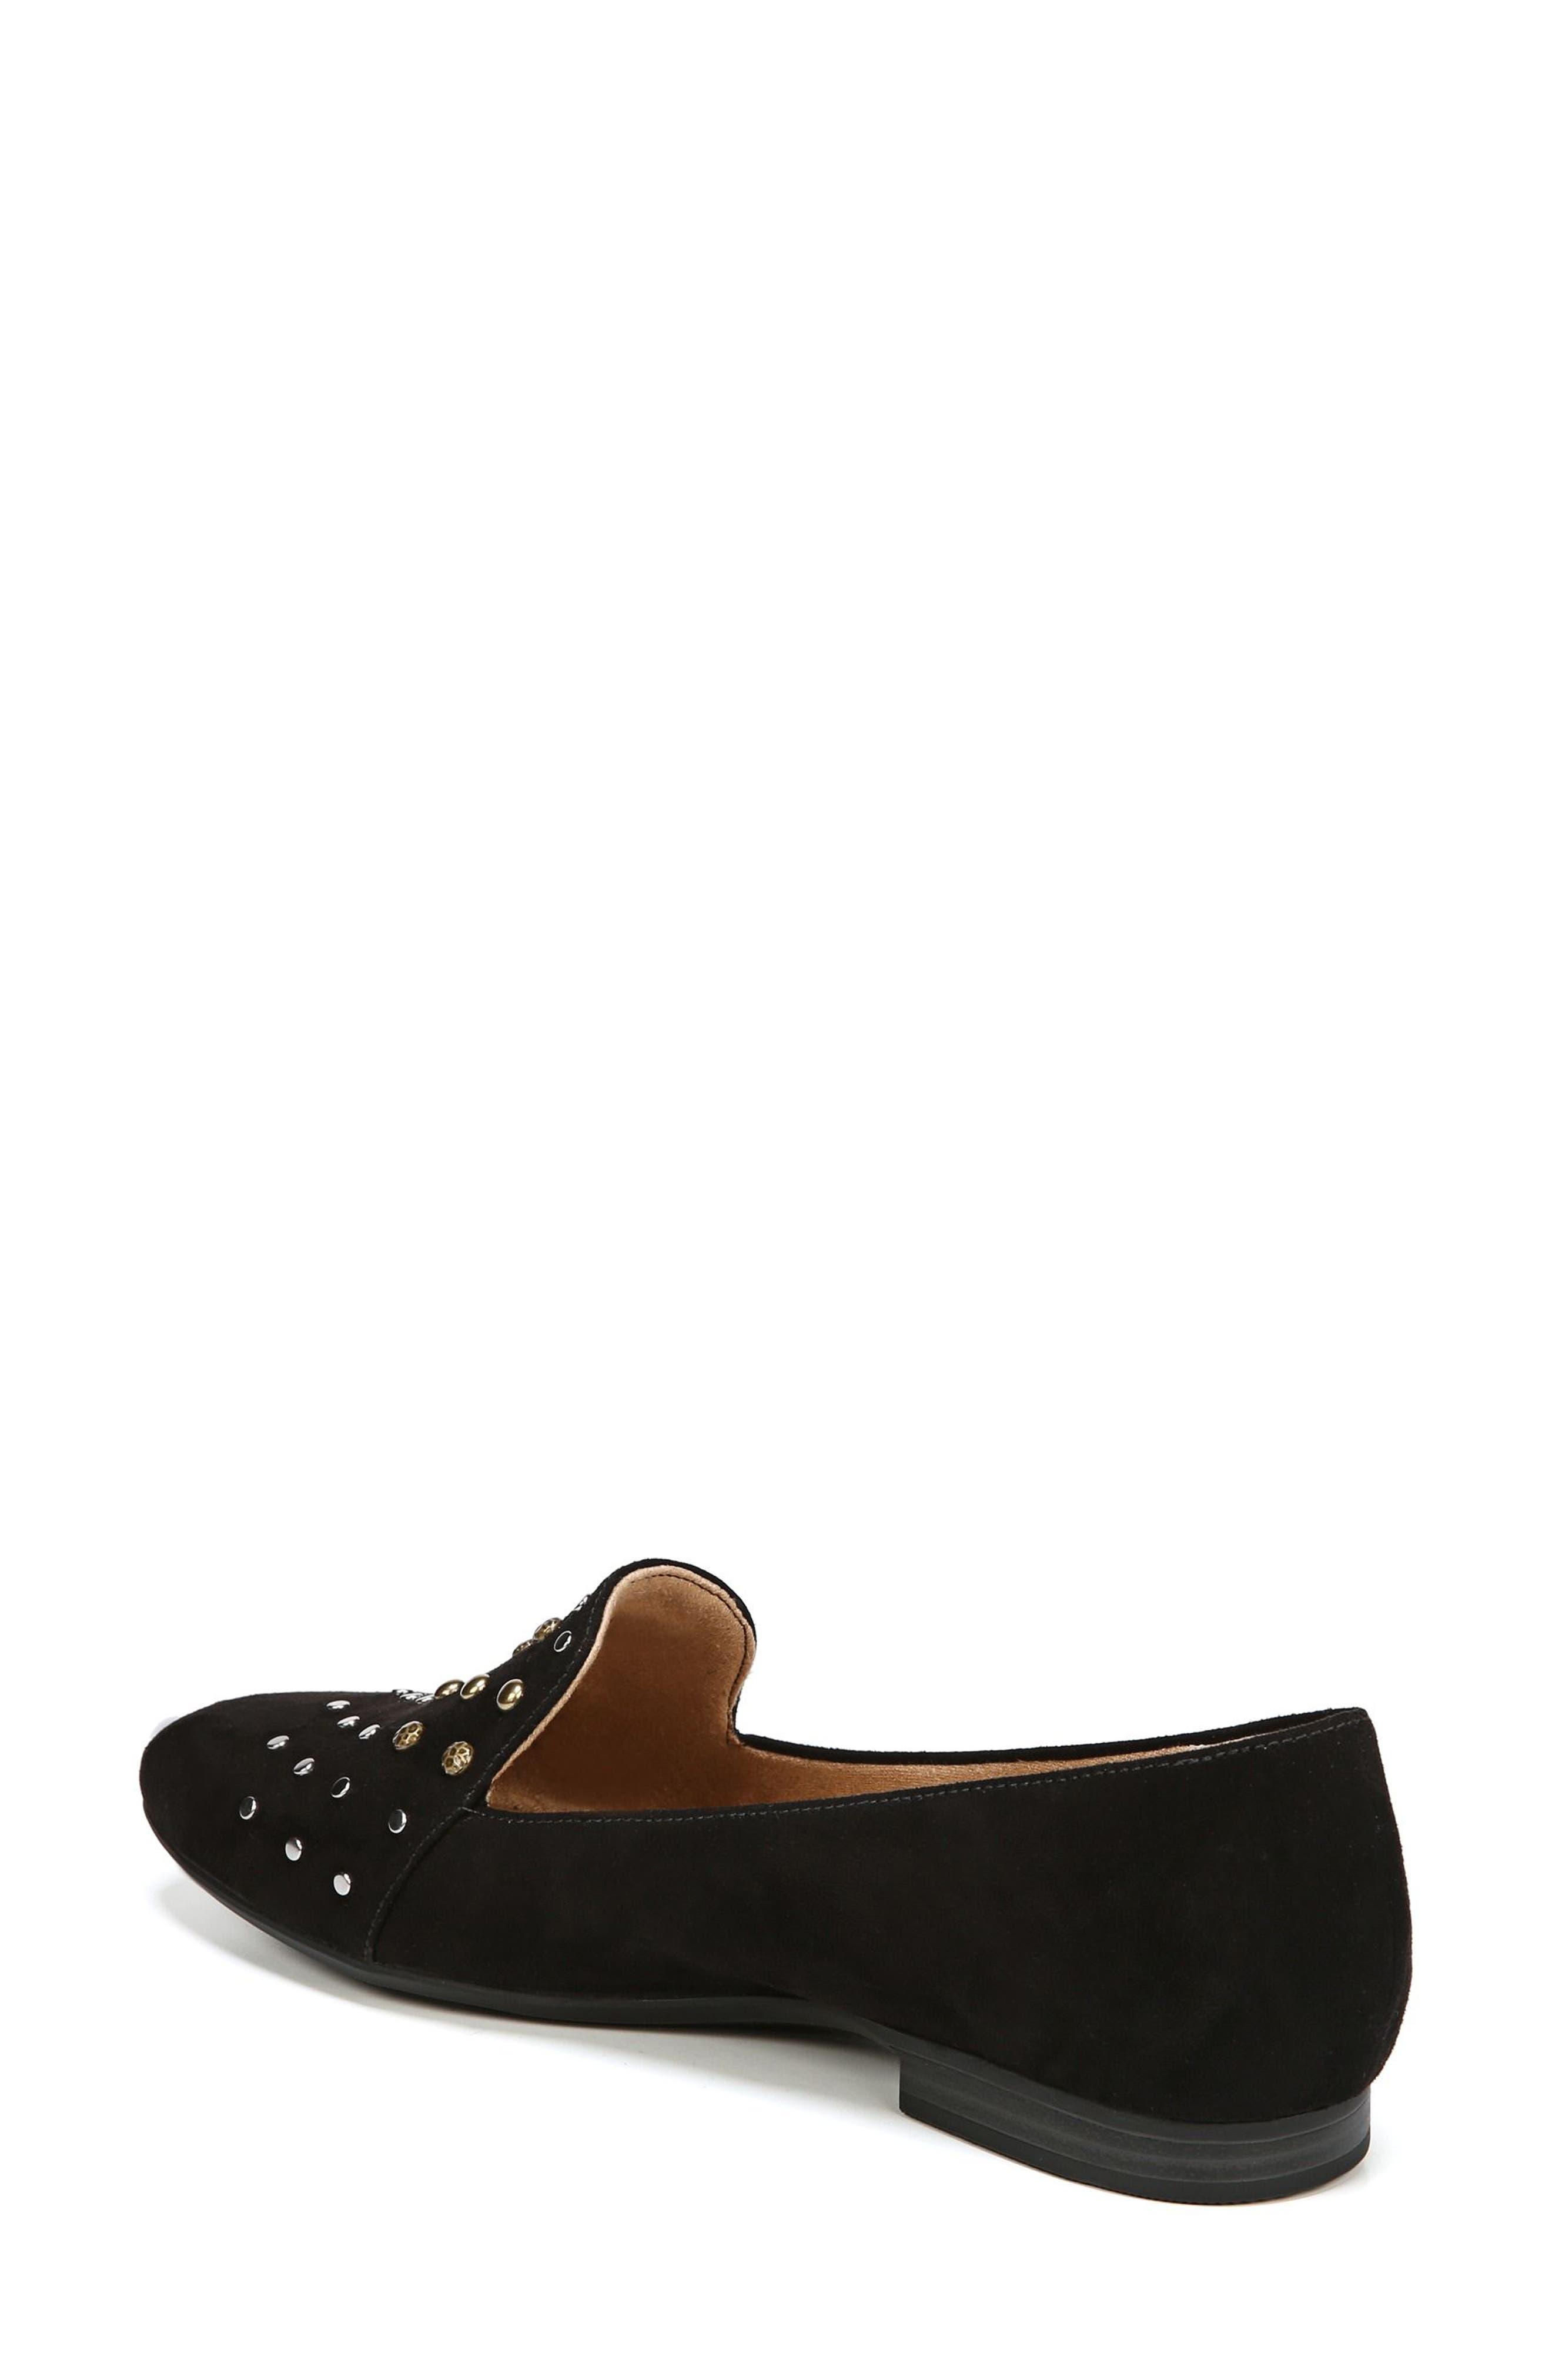 Emiline 4 Loafer,                             Alternate thumbnail 2, color,                             Black Fabric